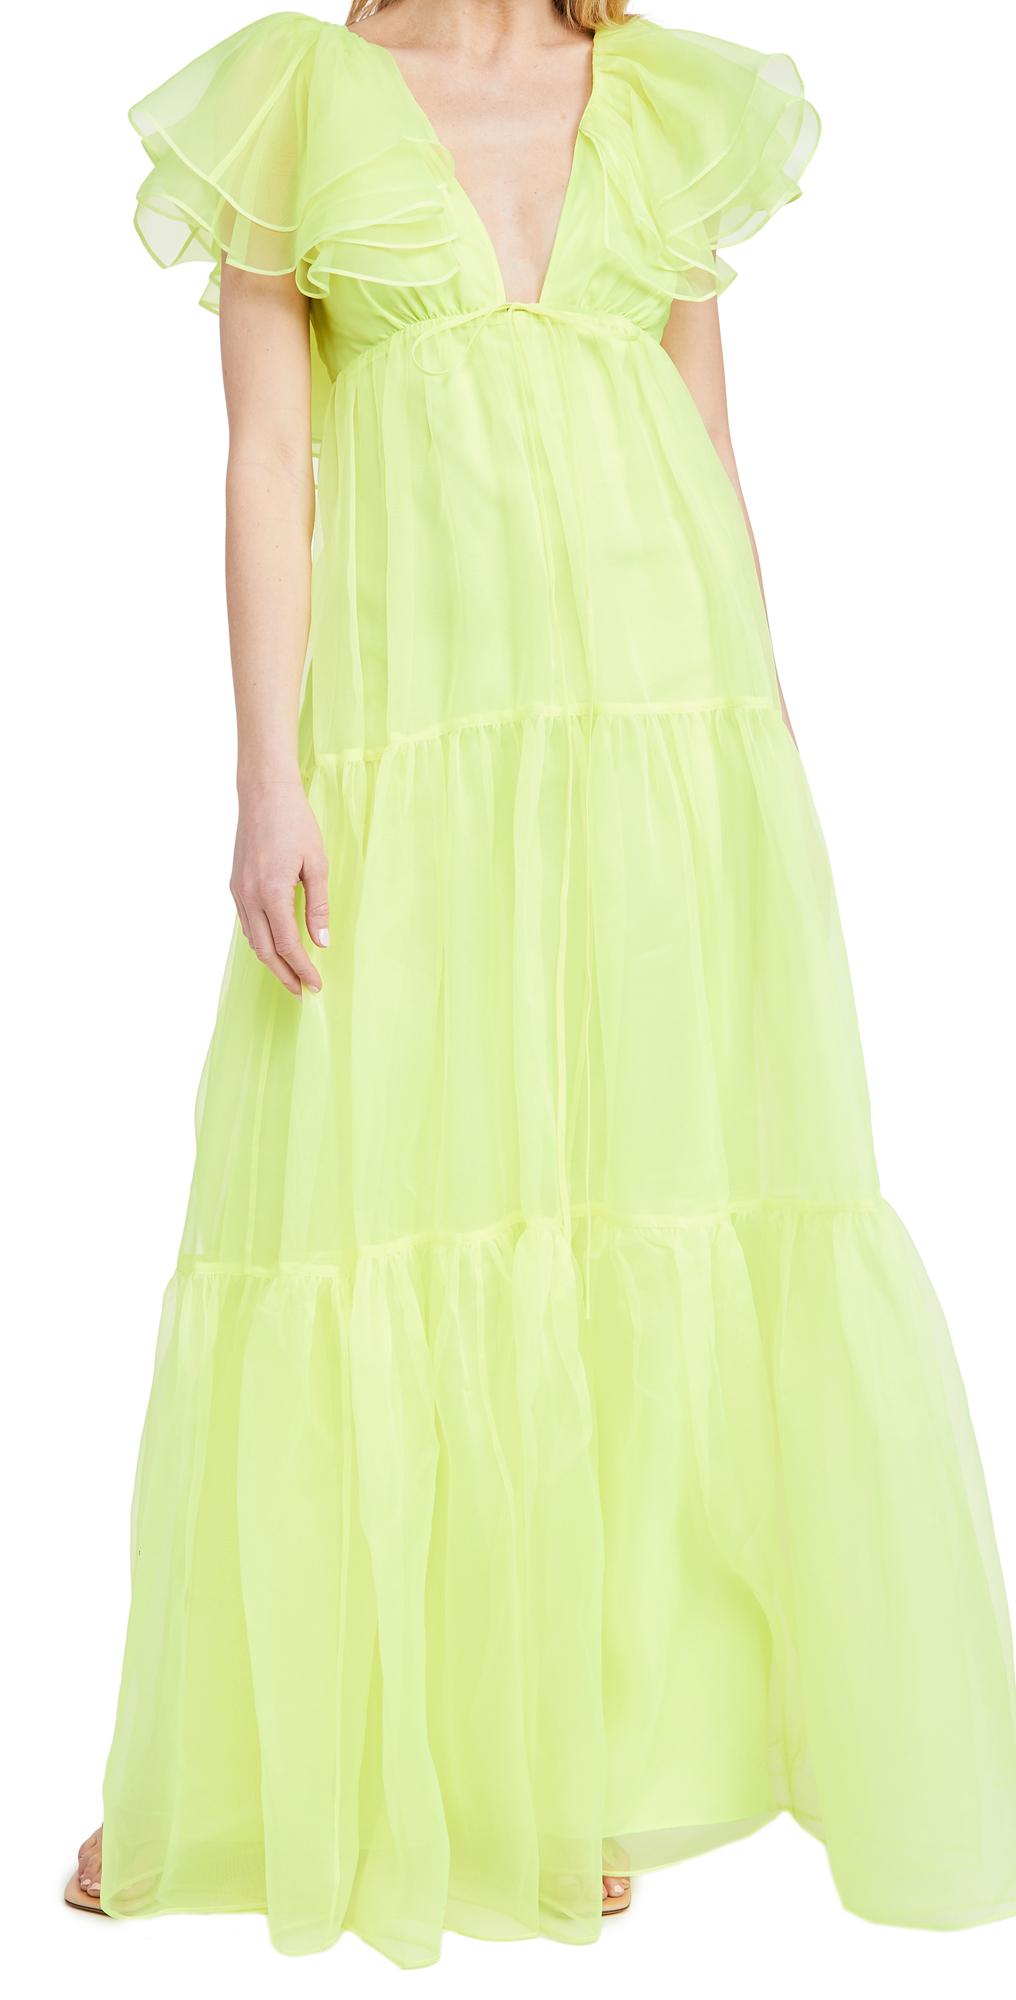 Cinq a Sept Chrishelle Dress